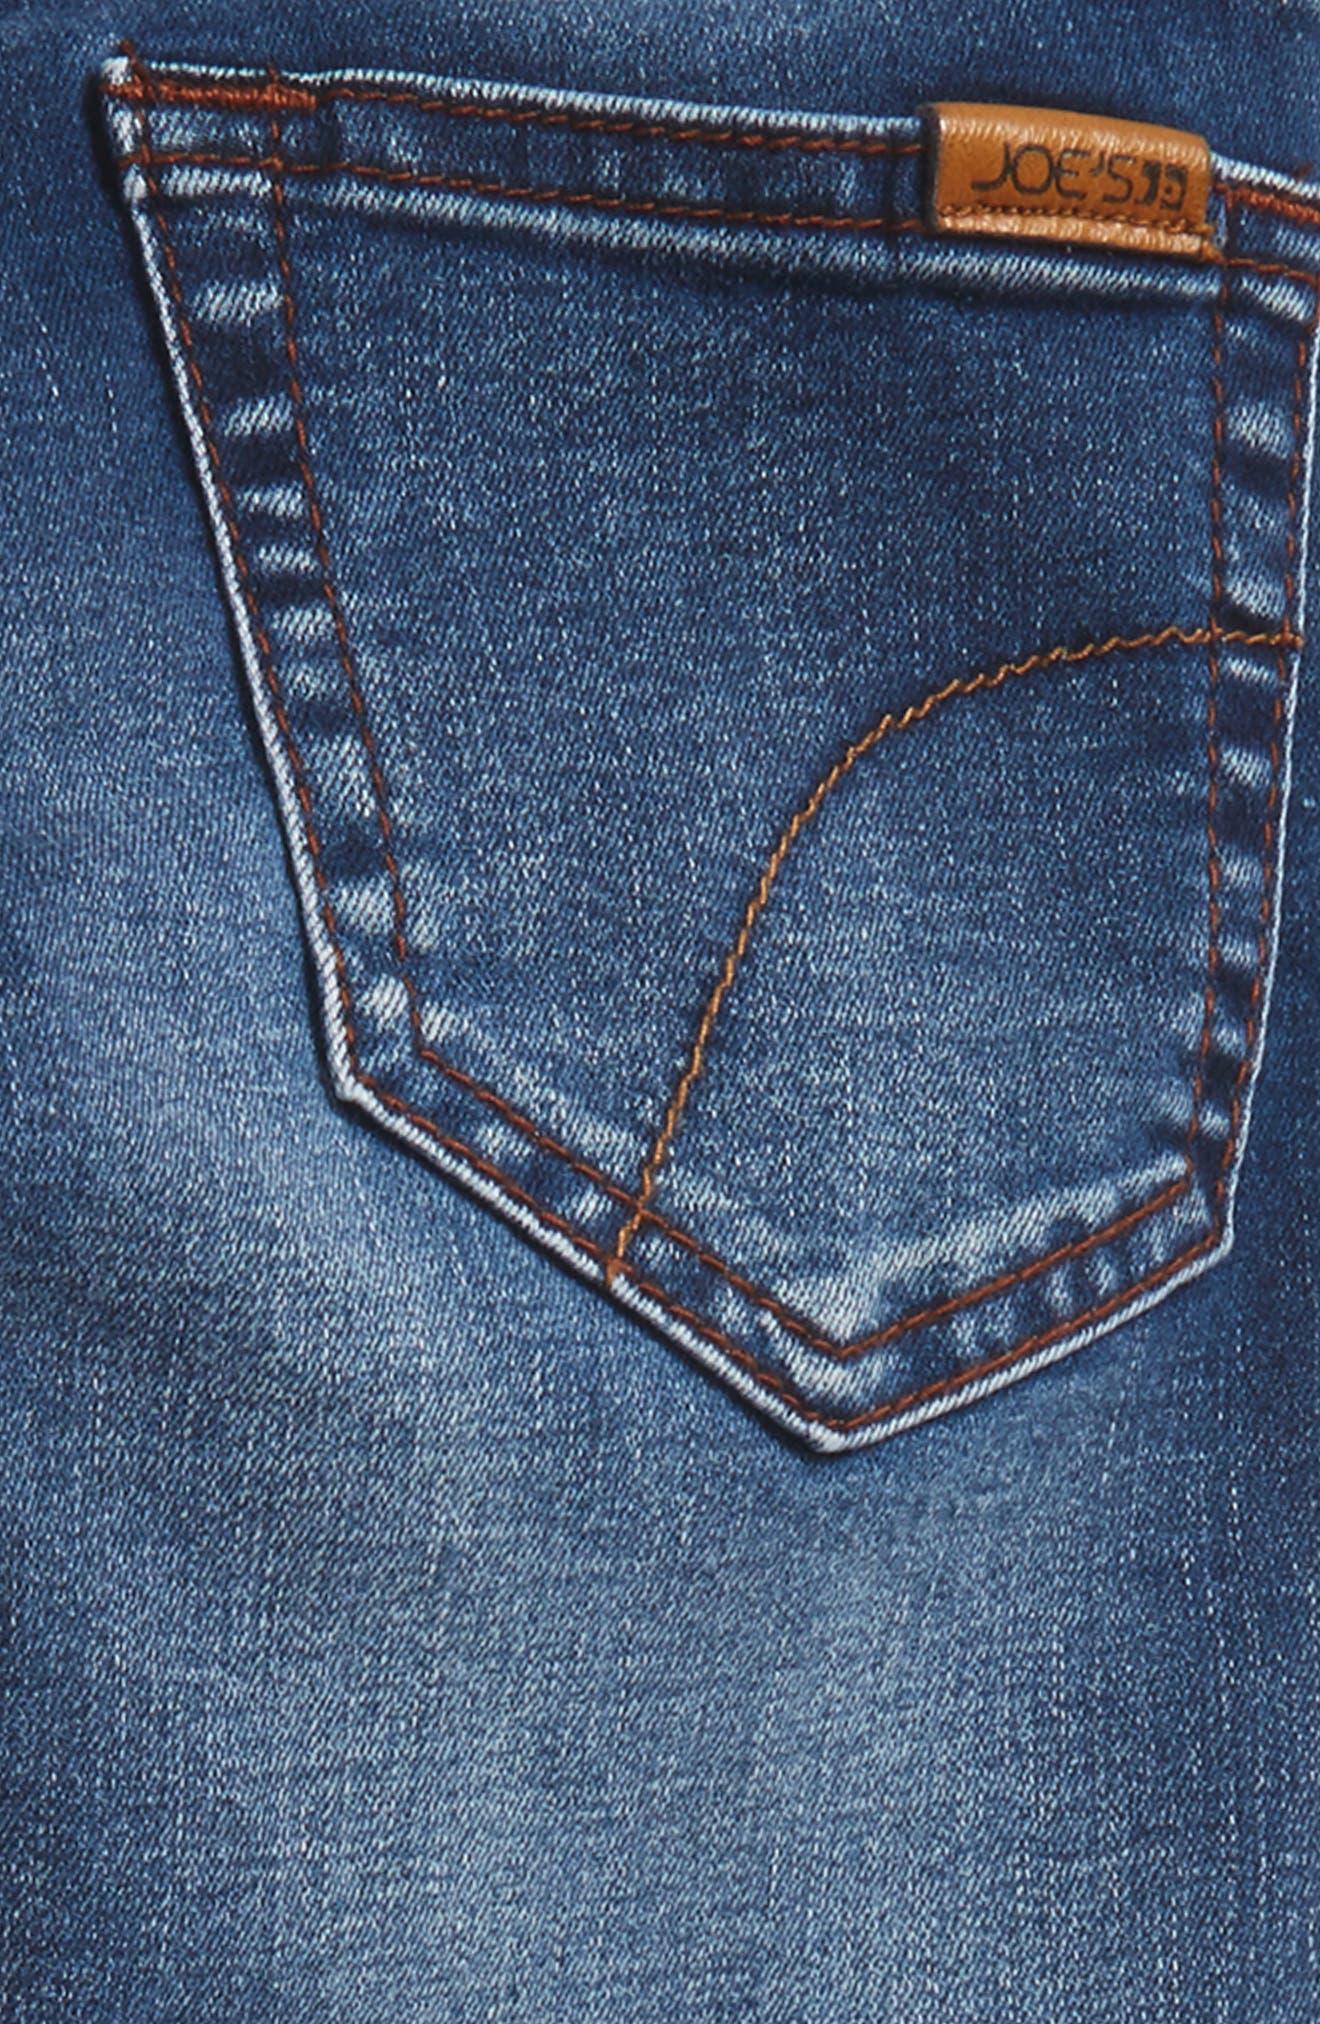 Brixton Slim Fit Stretch Jeans,                             Alternate thumbnail 3, color,                             Cielo